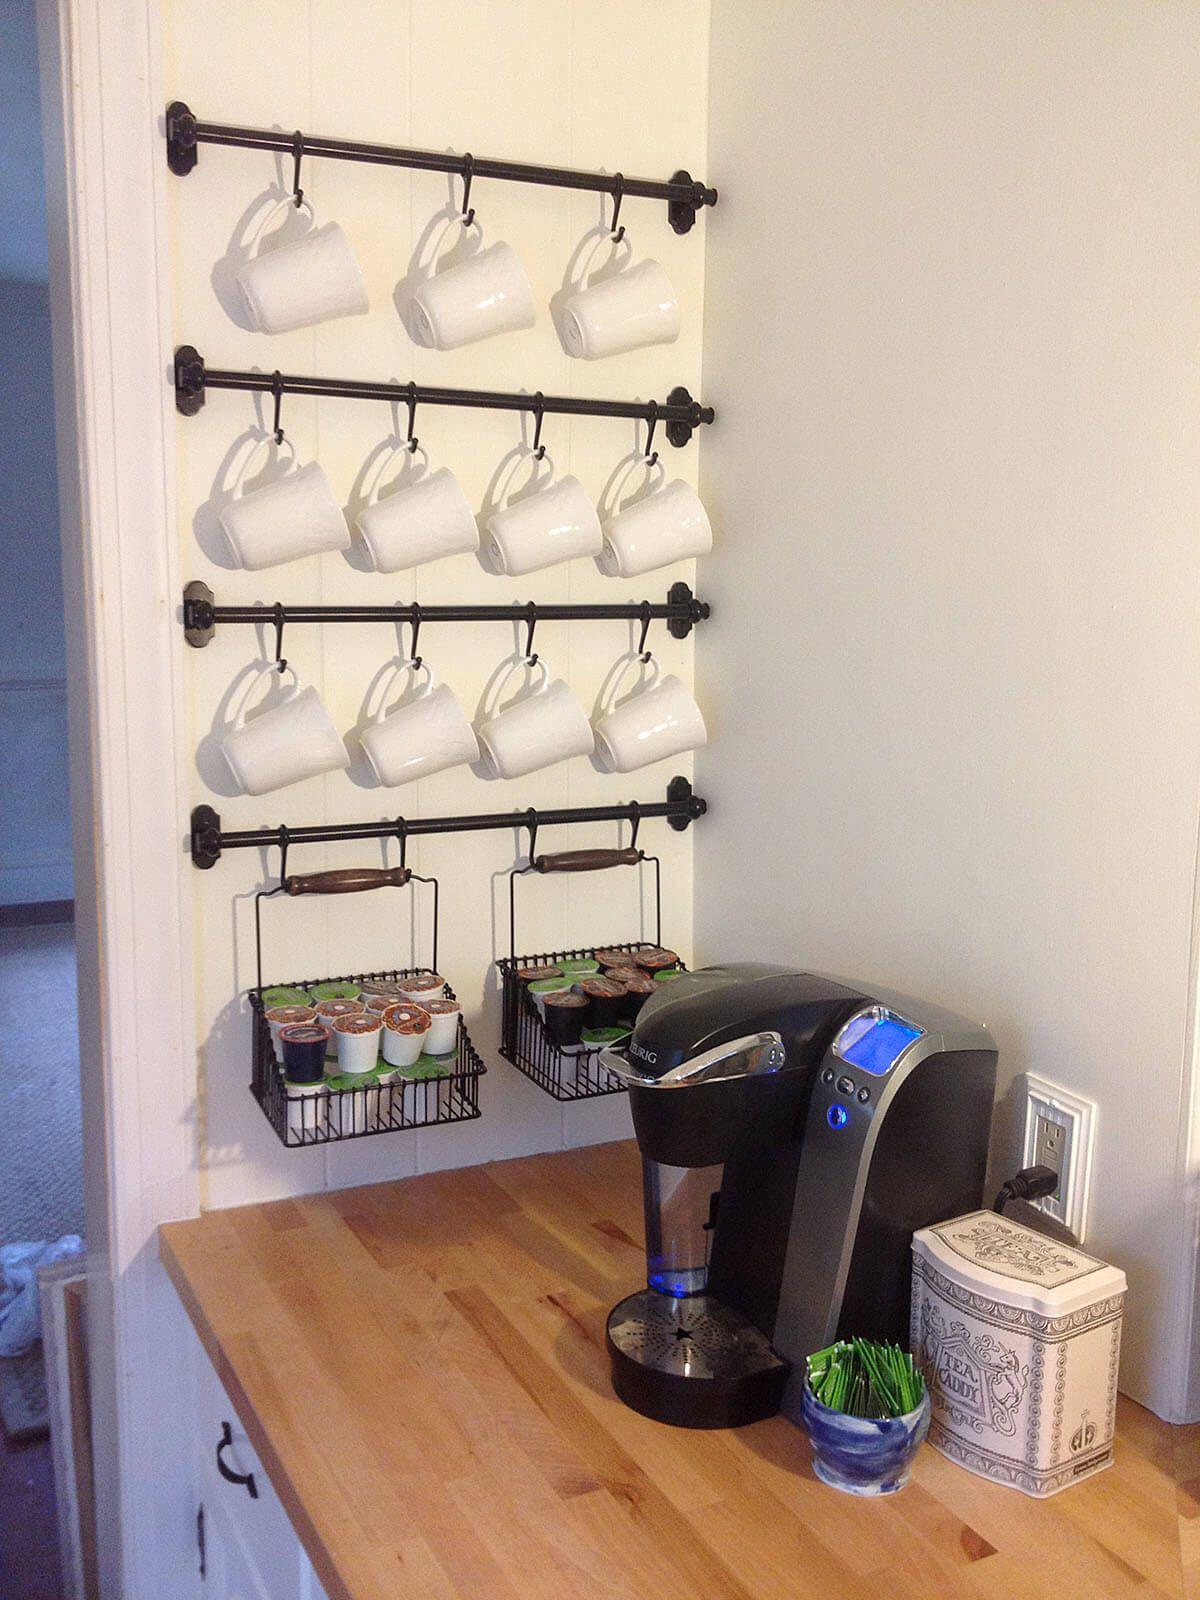 24 Fun and Creative Coffee Mug Organization Ideas | Pinterest | Ideen